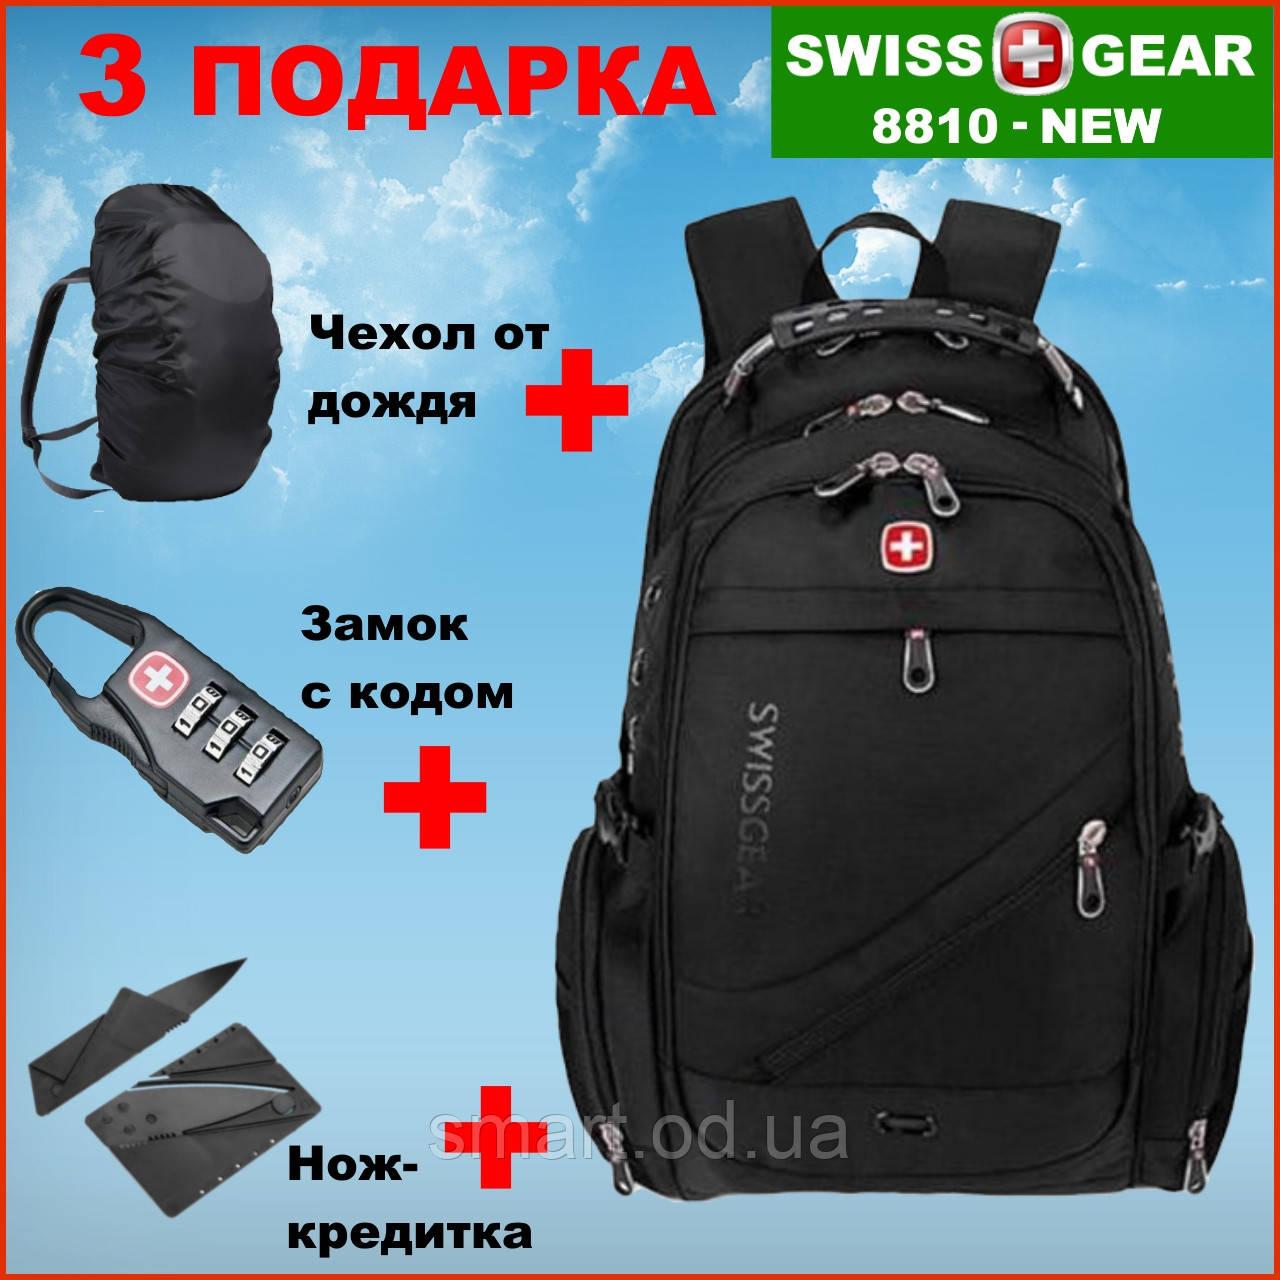 de02a1f4244c Швейцарский рюкзак WENGER SwissGear 8810 black с замком,нож-кредитка, дождевик, USB, разъёмом под наушники